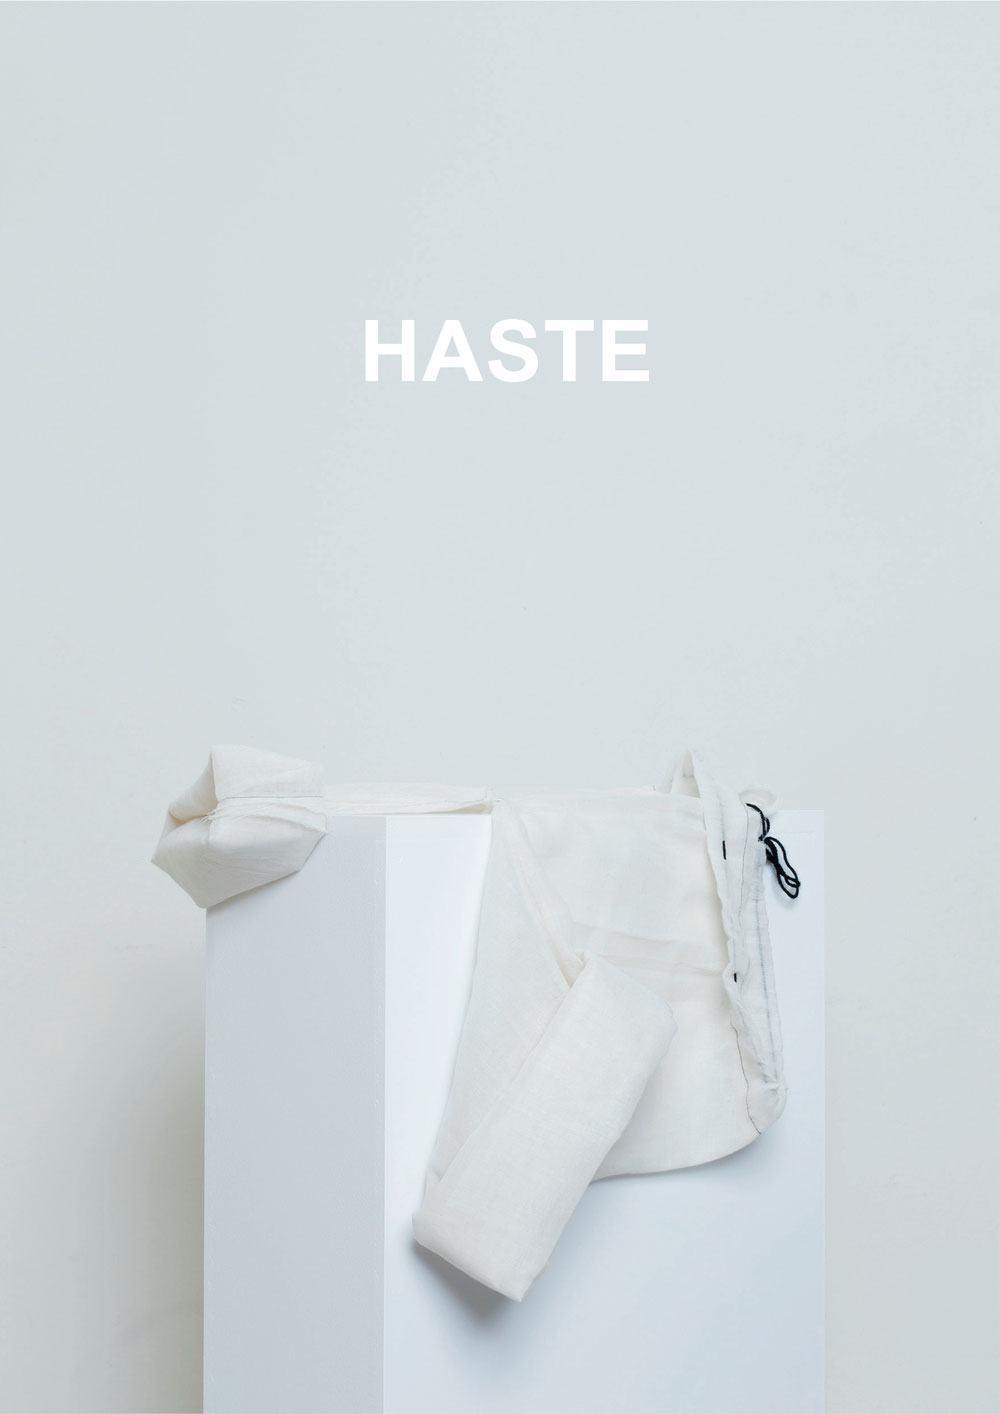 Haste by Alice Davidson